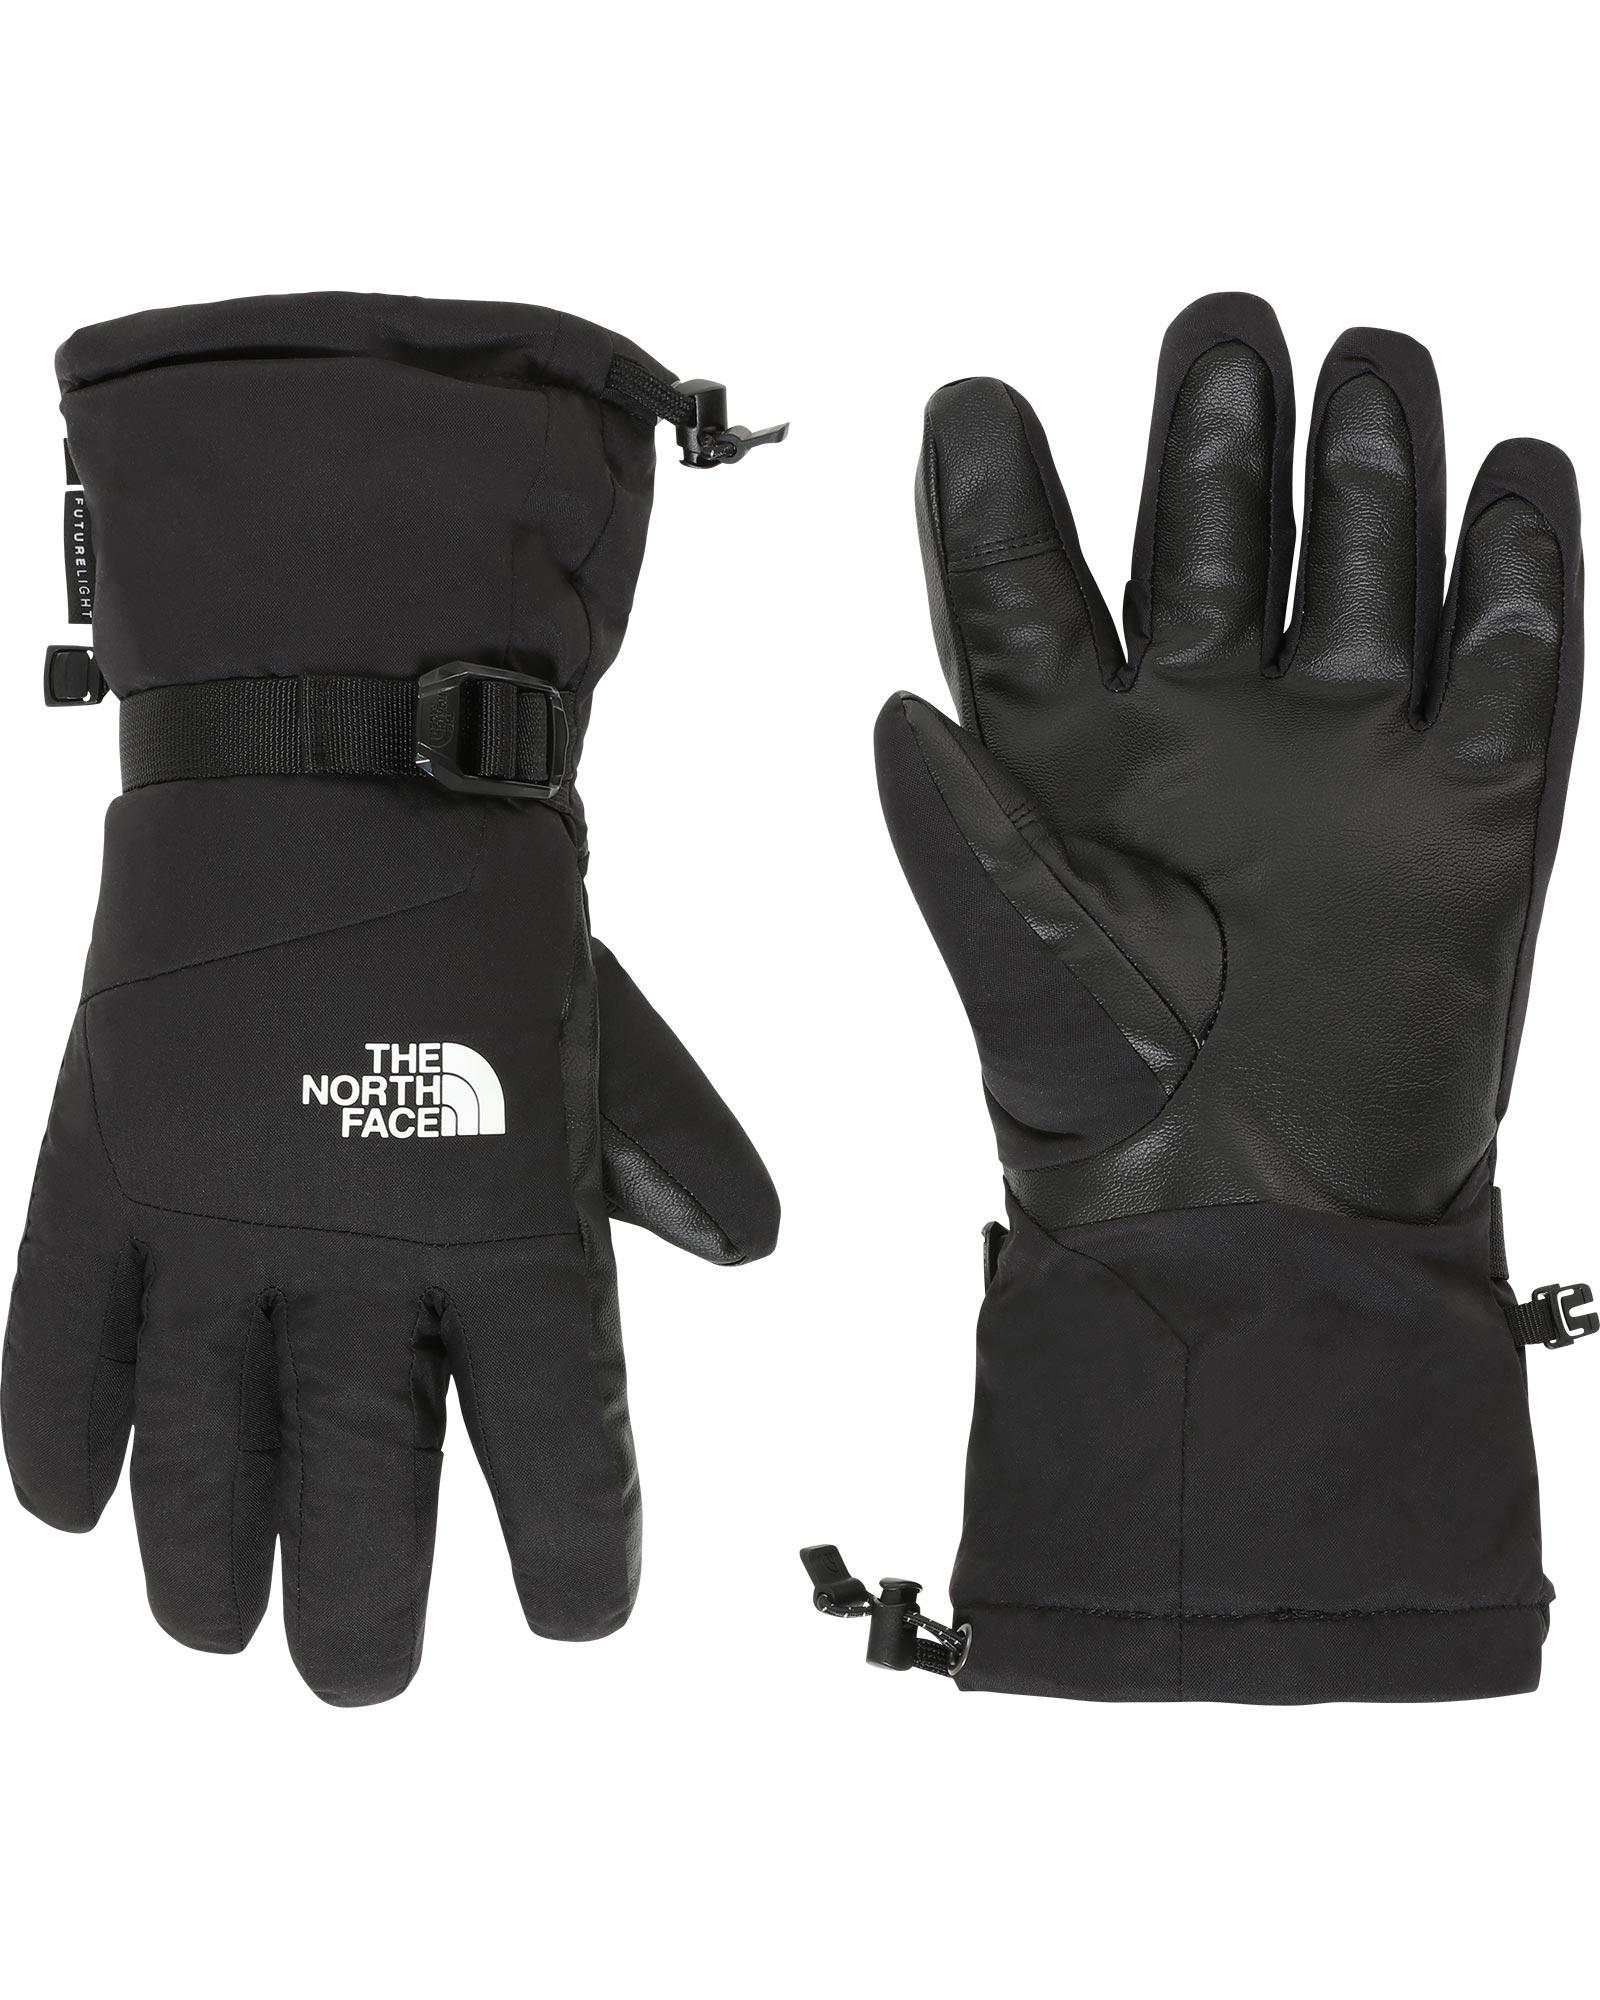 The North Face Men's Montana FUTURELIGHT Steep Etip Ski Gloves 0